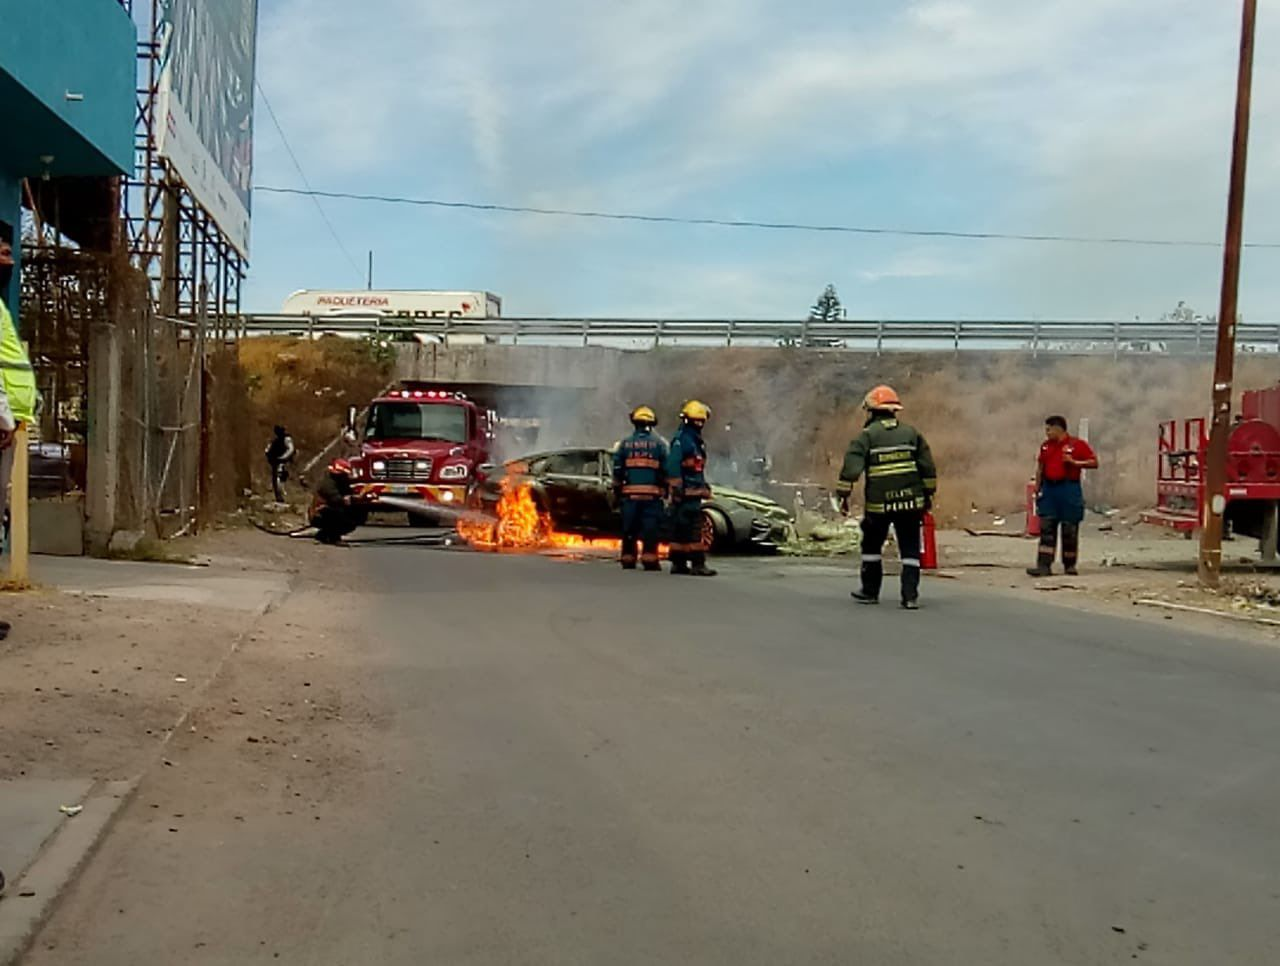 5 muertos del cartel Santa Rosa de Lima en Guanajuato (Foto: Twitter@edgarfabianvf)